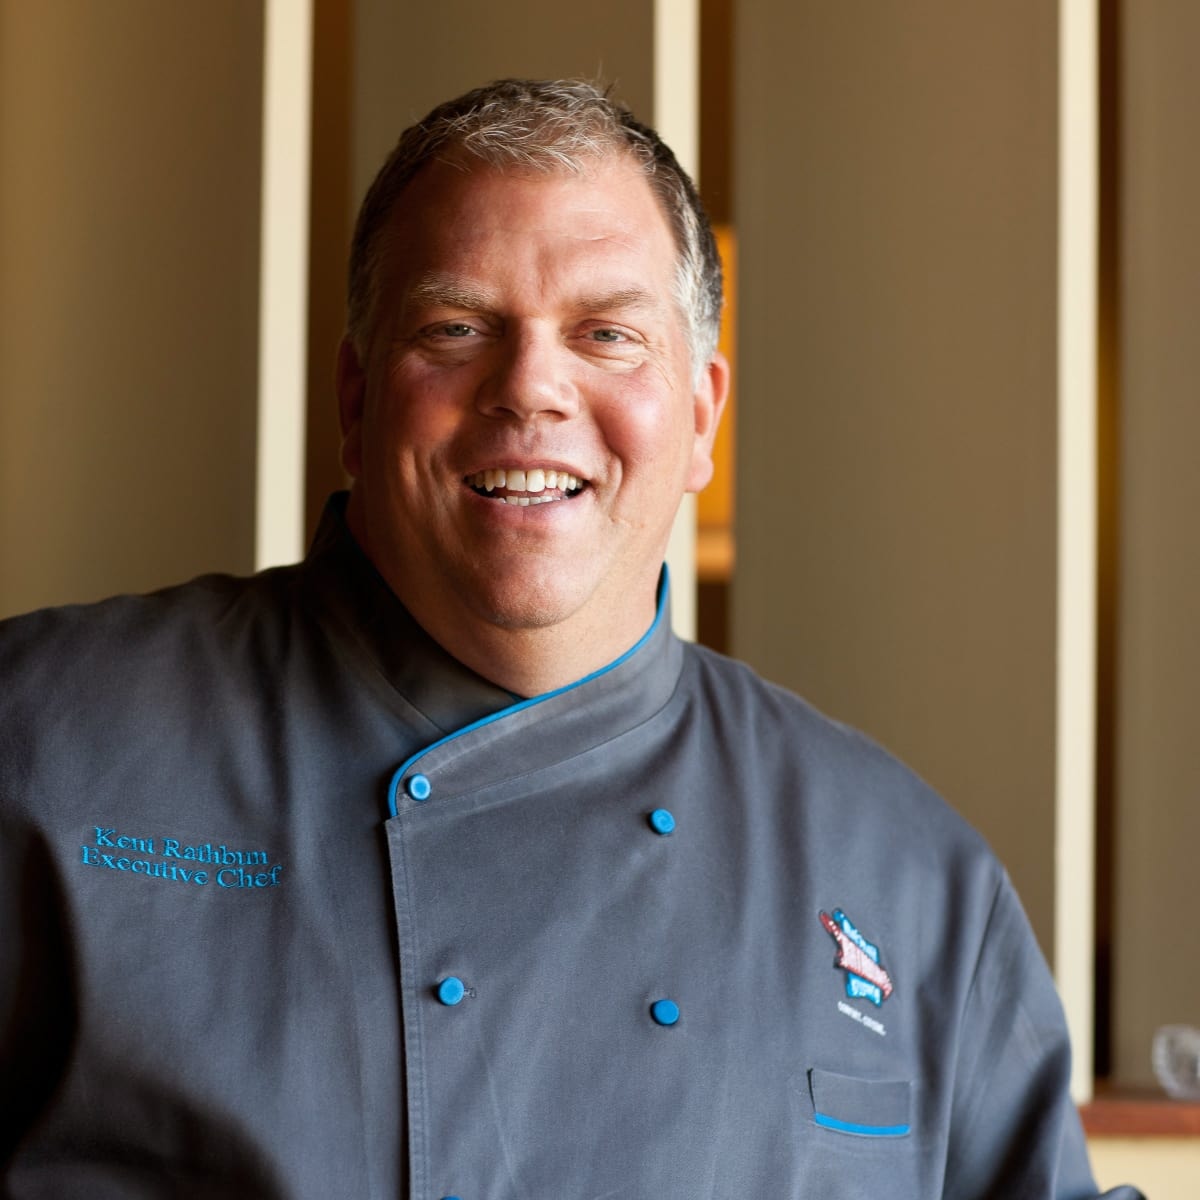 Dallas chef Kent Rathbun of Abacus